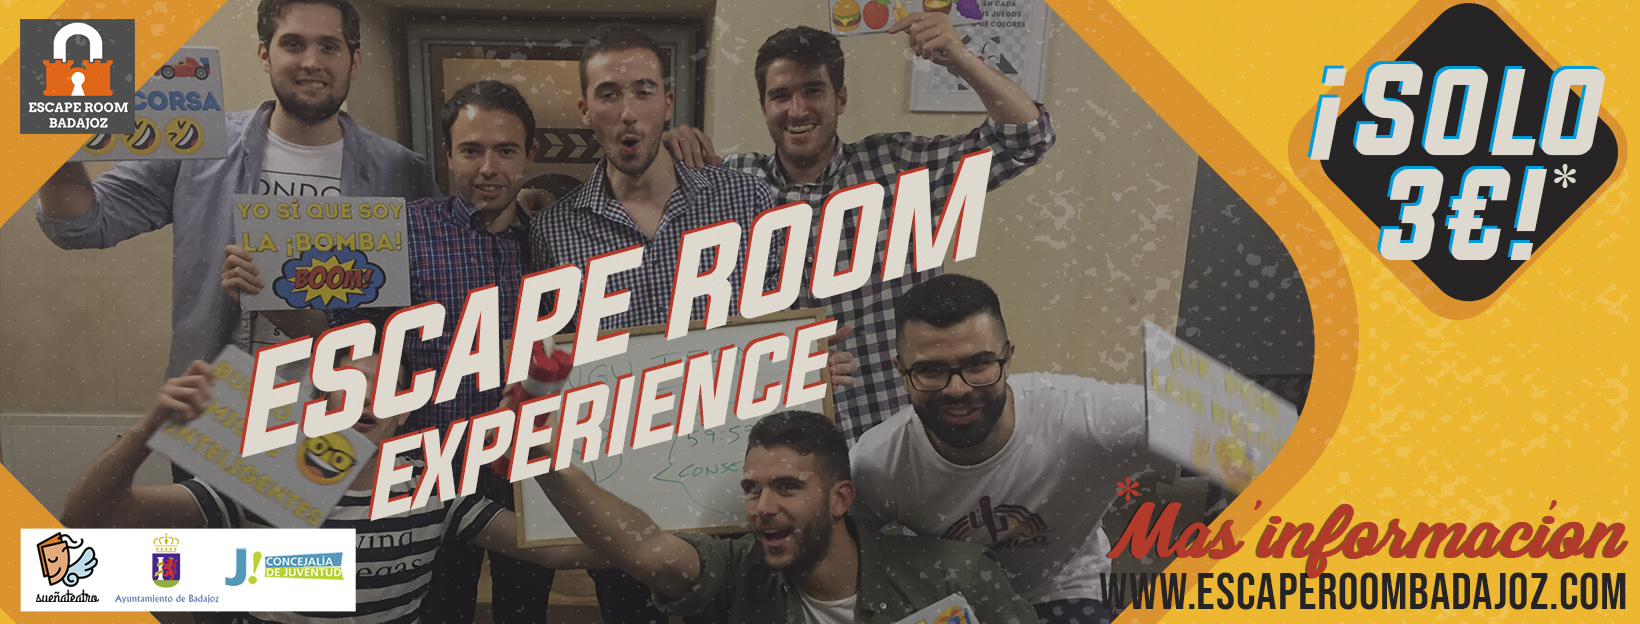 Escape-room-experience-badajoz-banner